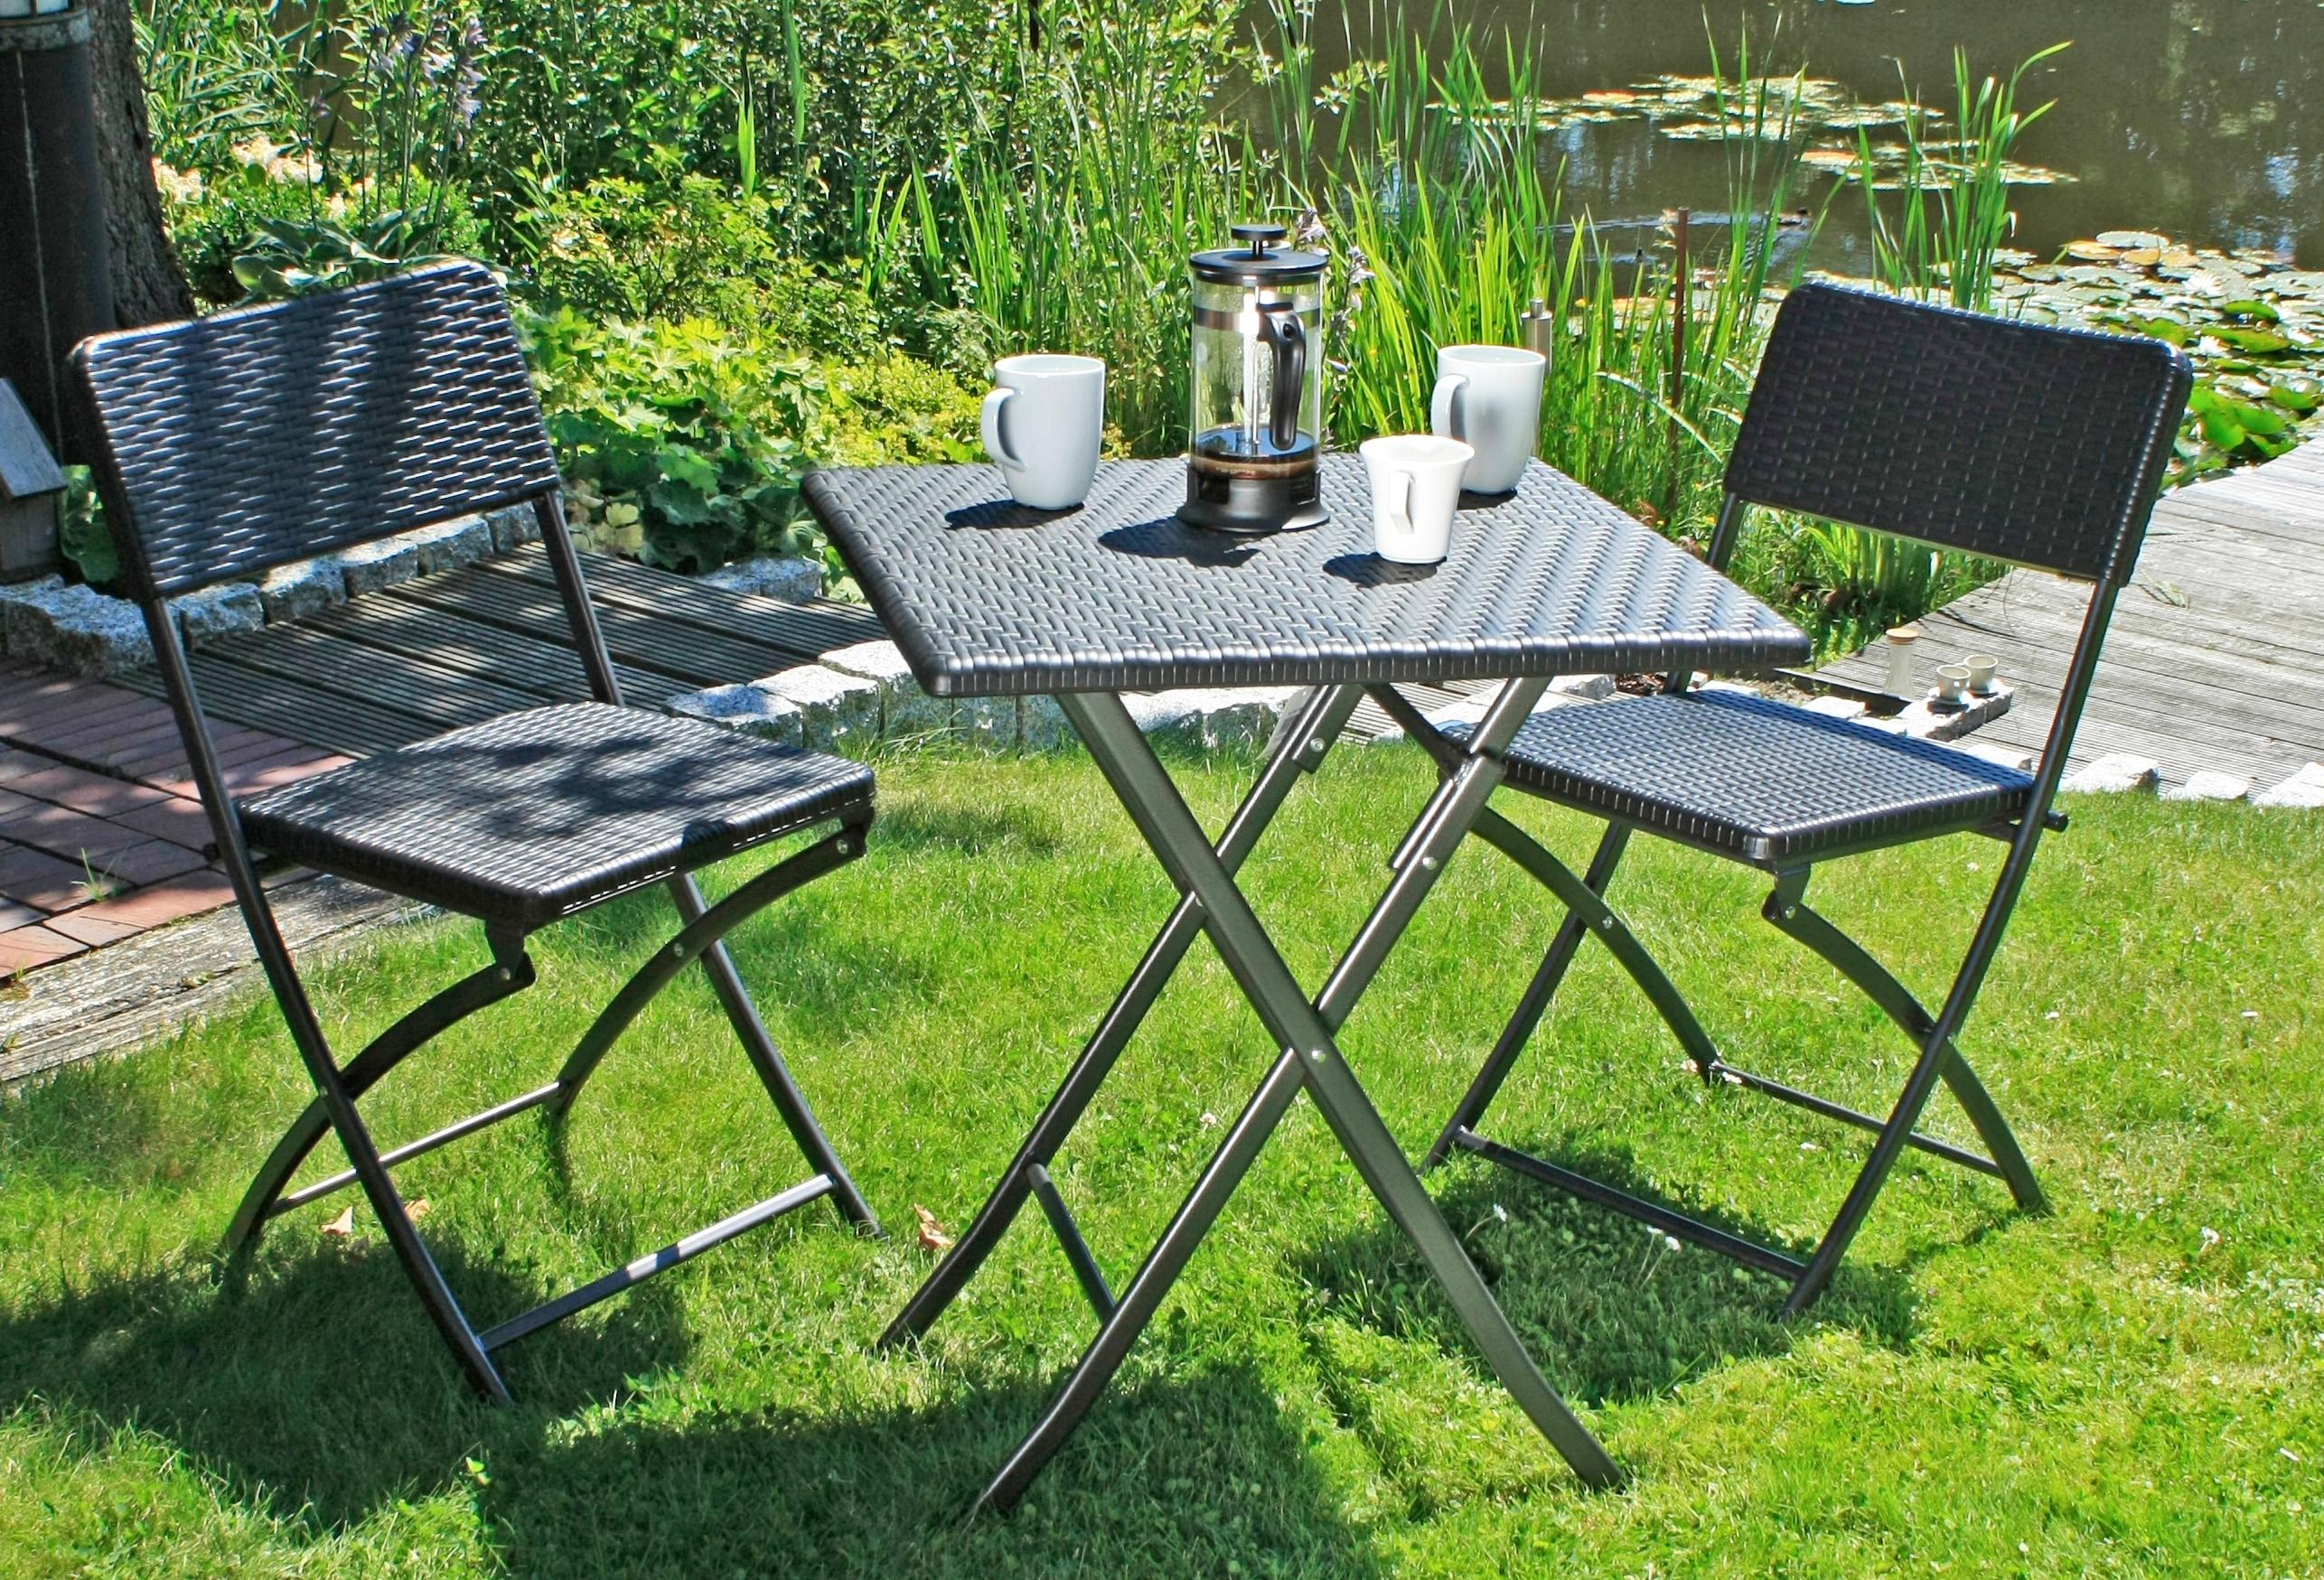 Tisch Klappbar Kunststoff.Garden Pleasure Gartenmöbelset Ventana 3 Tlg 2 Stühle Tisch Klappbar Kunststoff